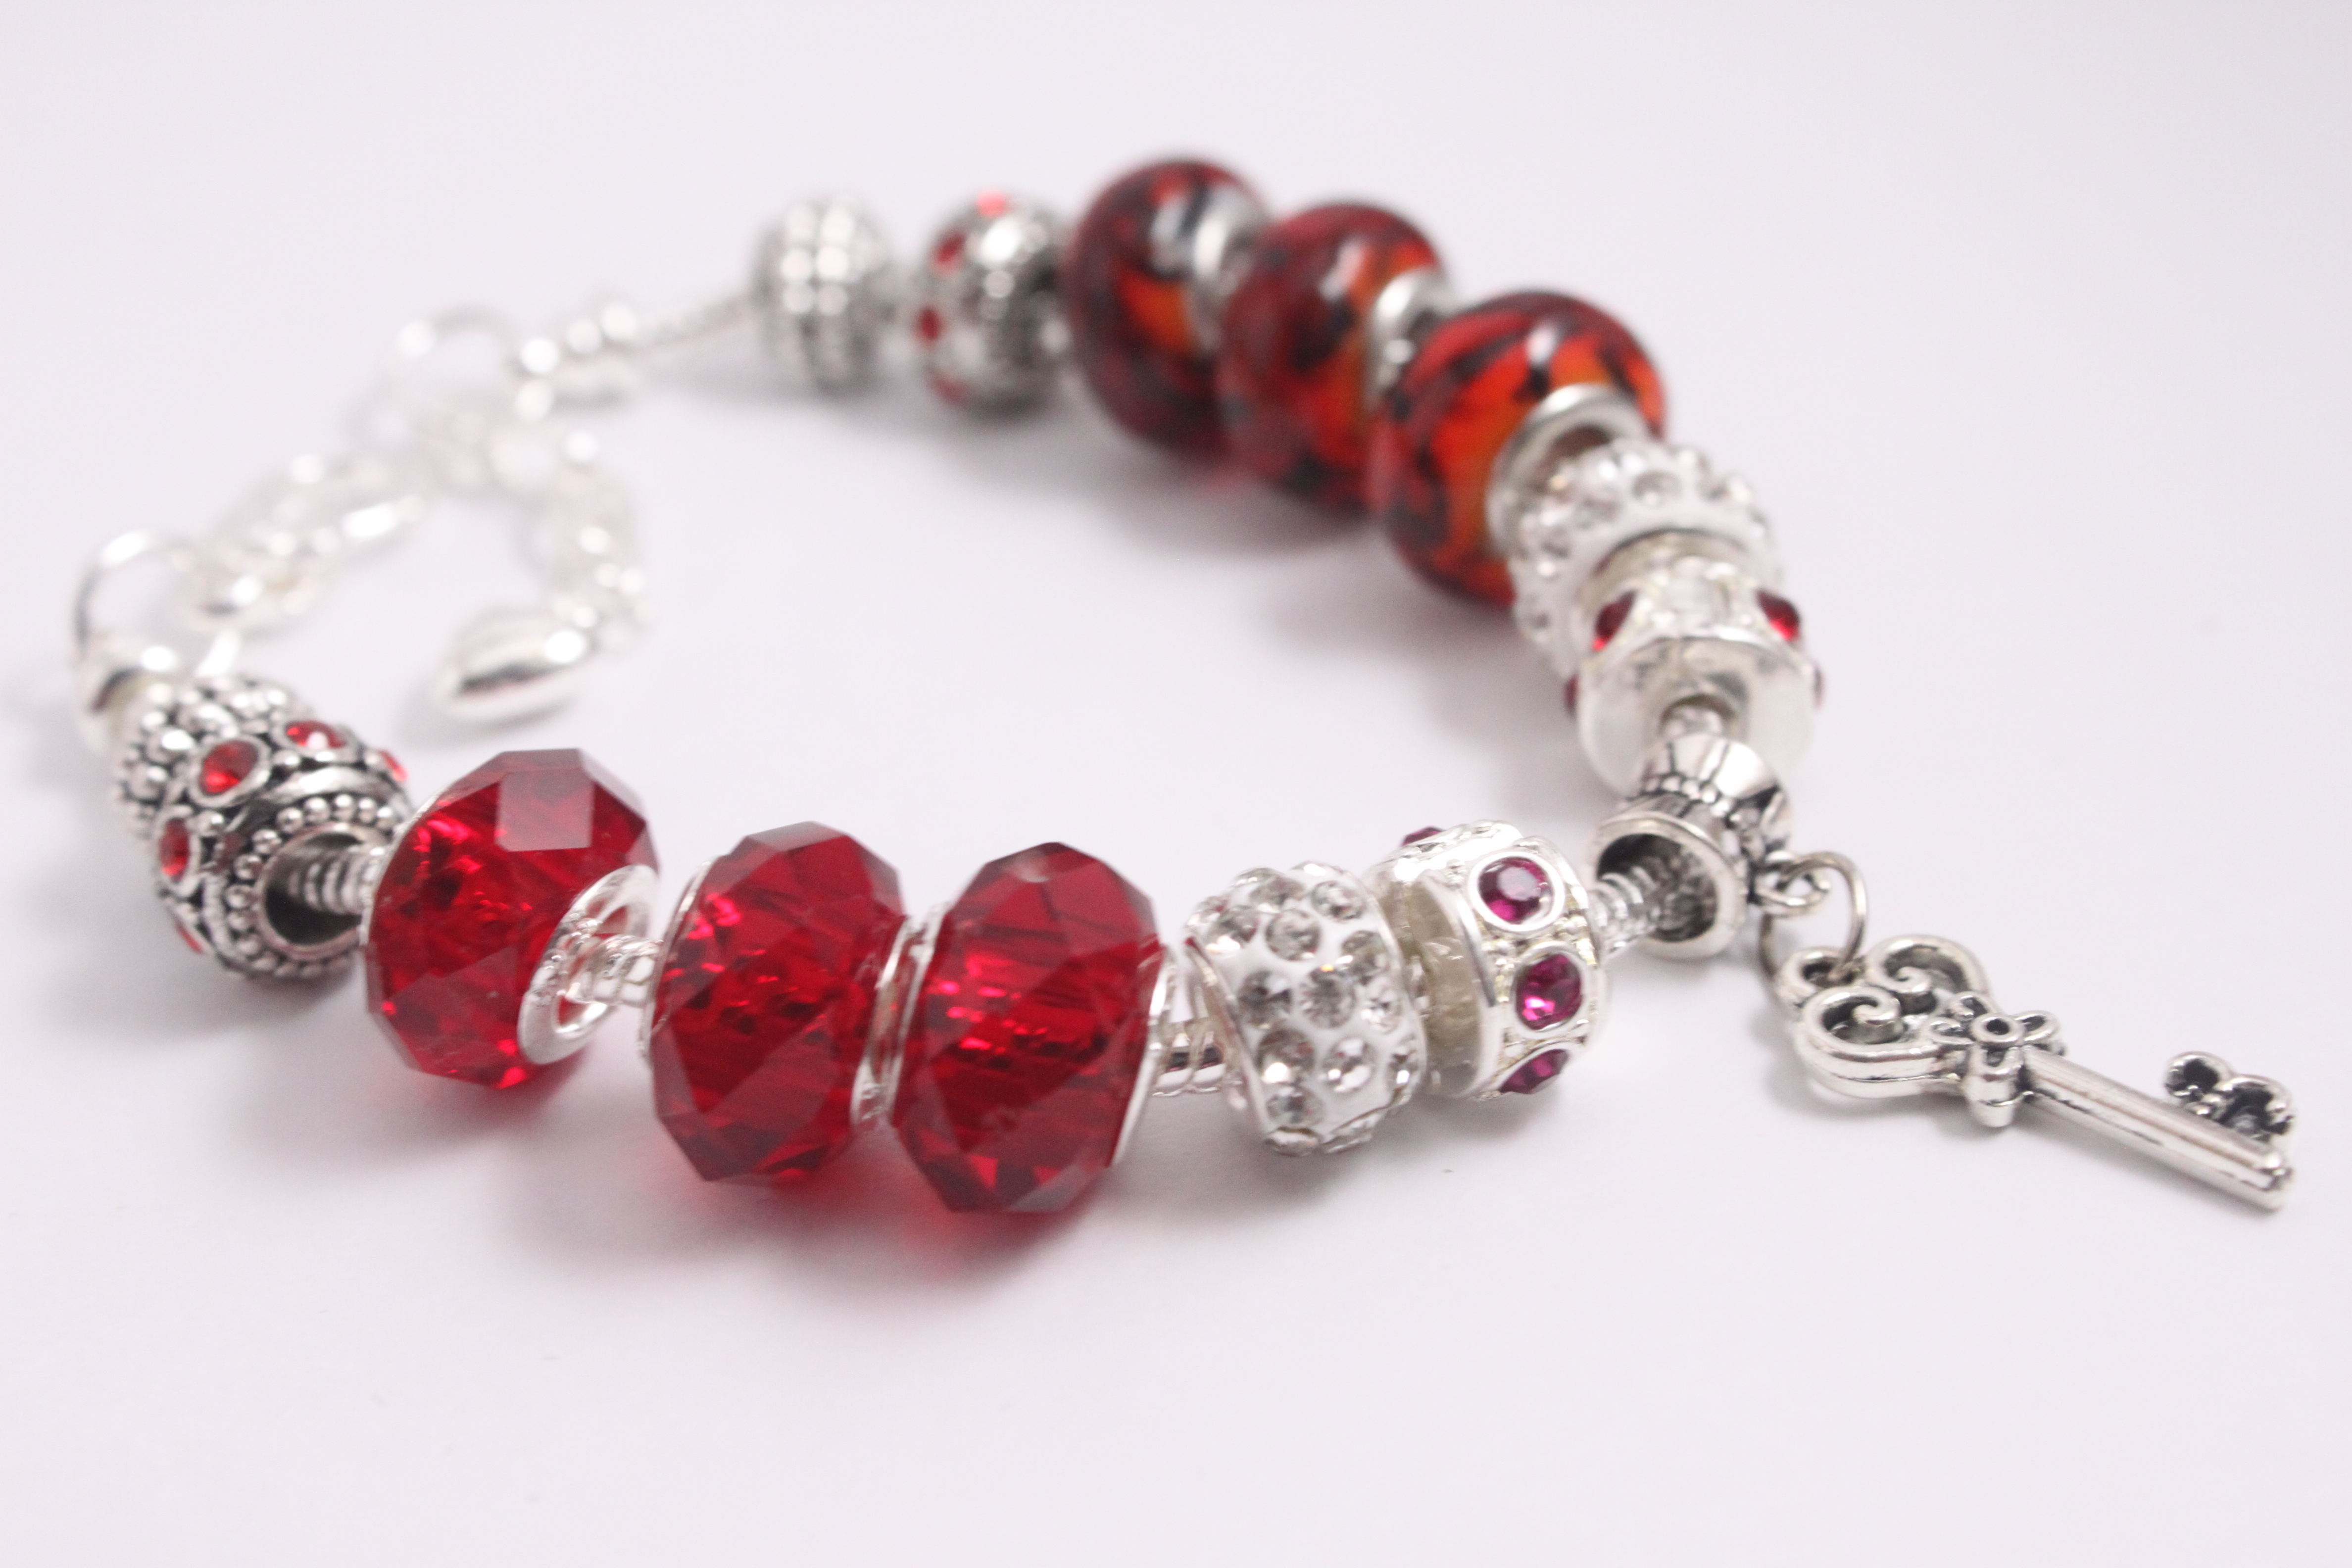 Key charm bracelet - red